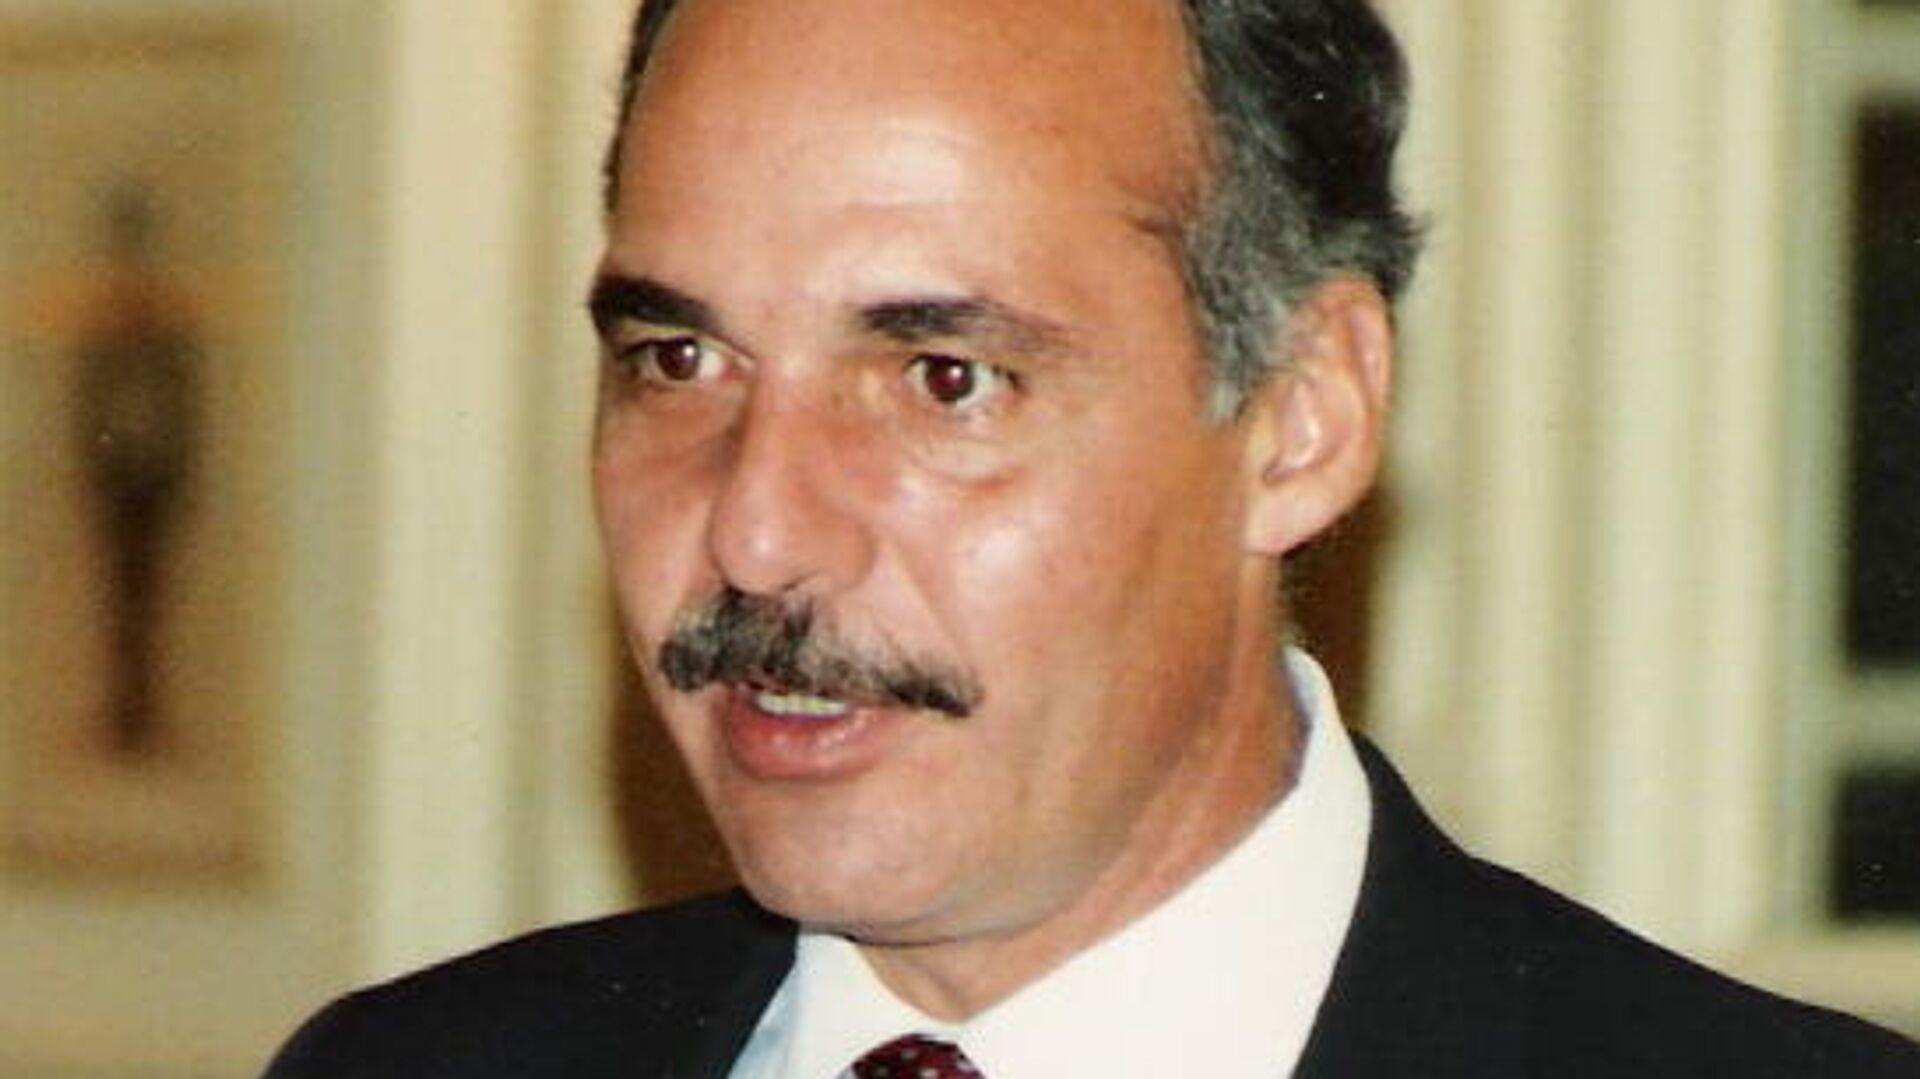 El expresidente salvadoreño Alfredo Cristiani (1989-1994) - Sputnik Mundo, 1920, 03.10.2021